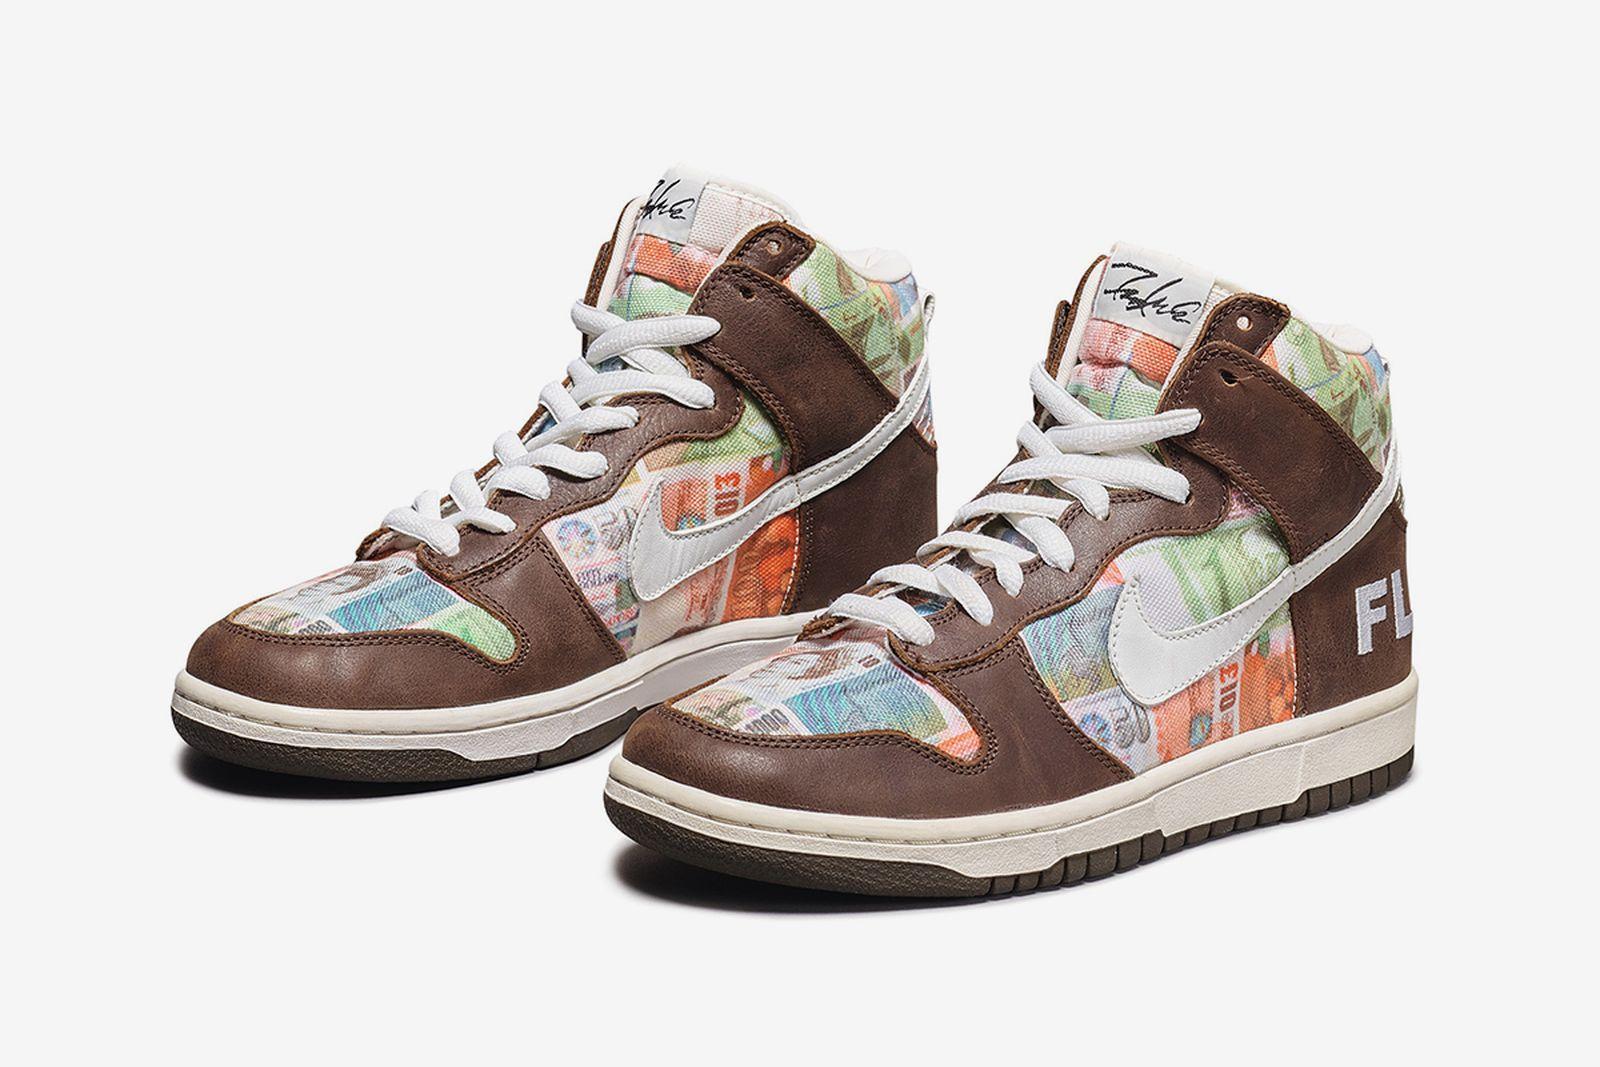 sothebys-nike-sneaker-auction-02